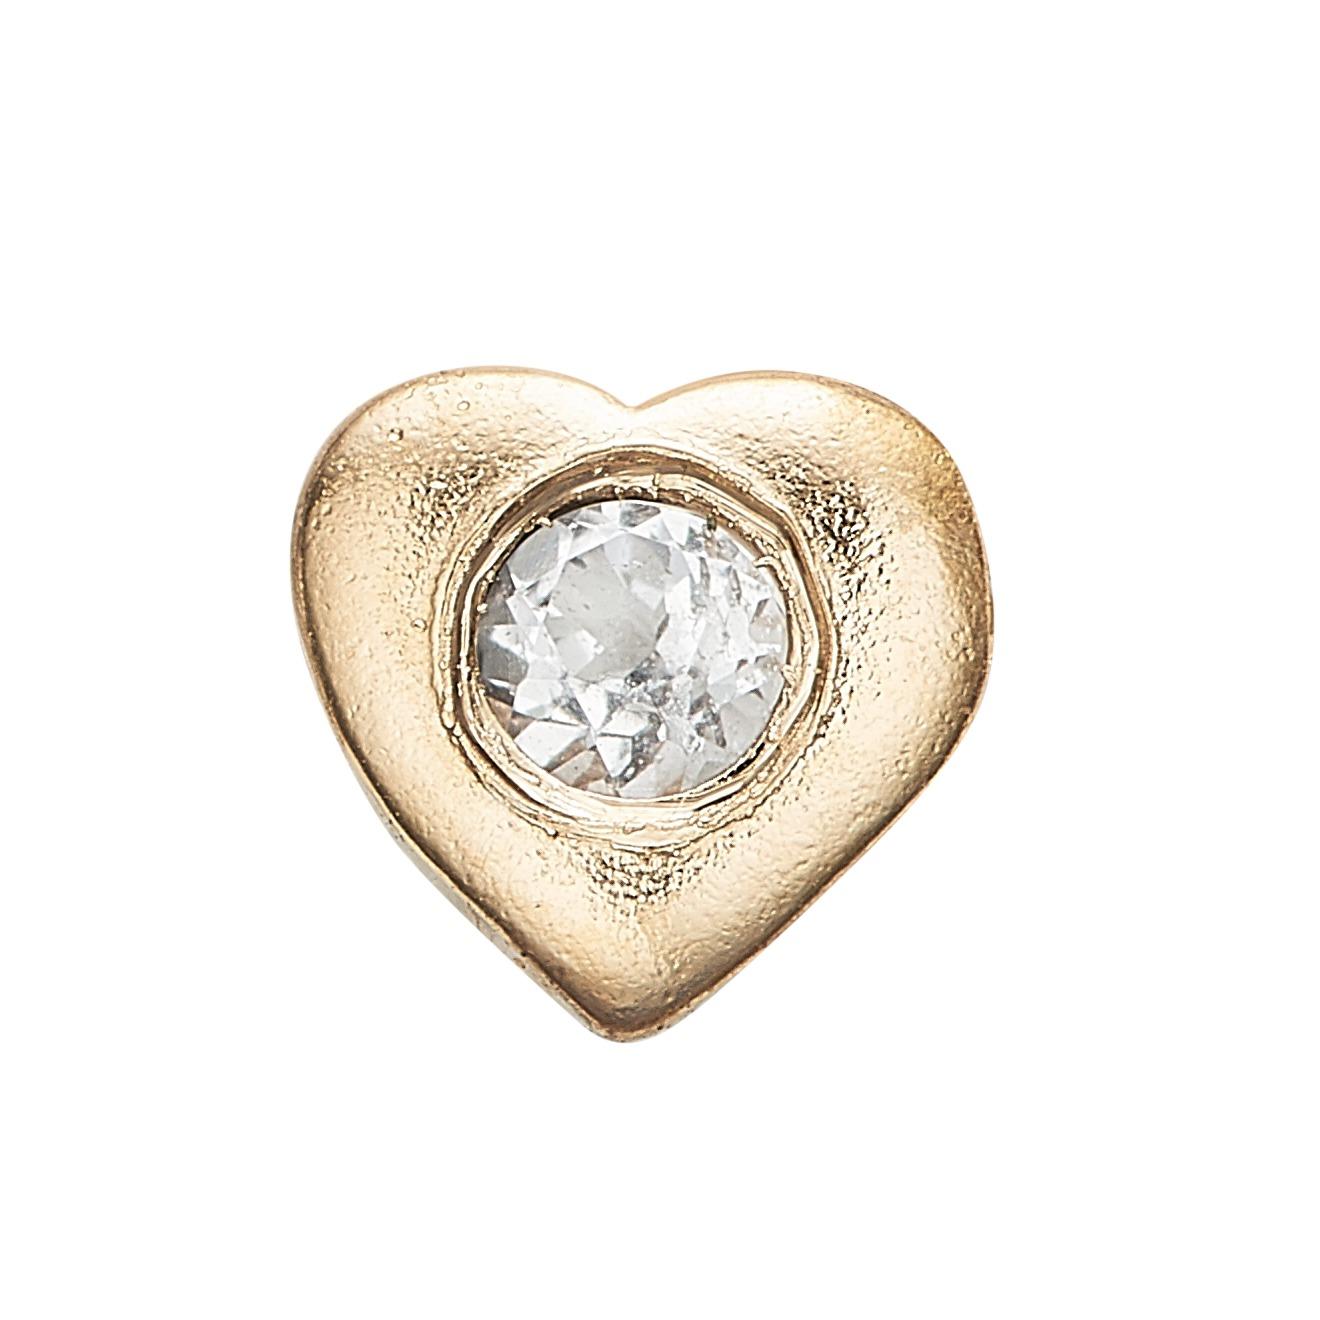 christina watches – Christina collect topas heart - 603-g1 fra brodersen + kobborg